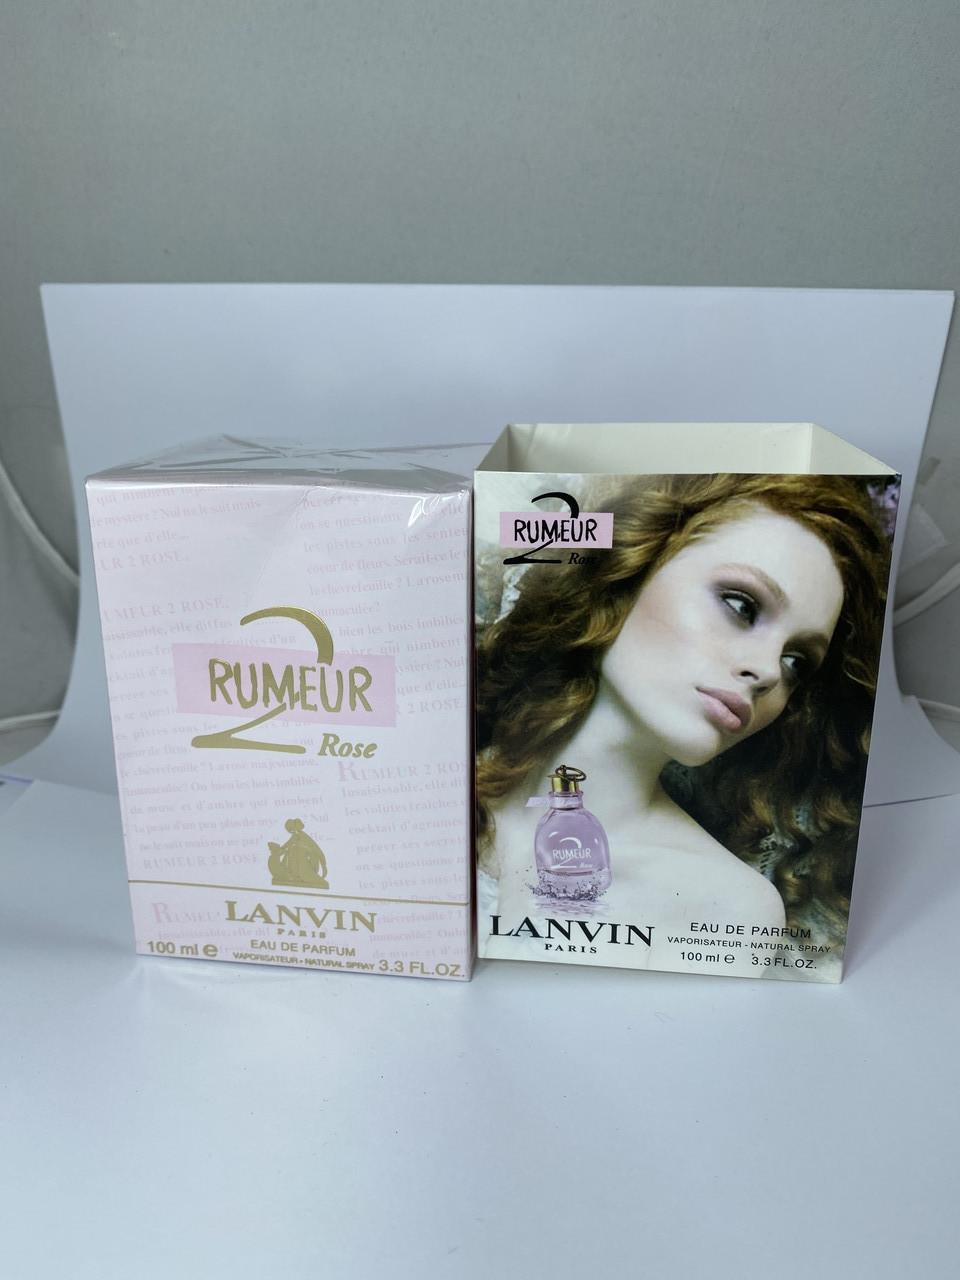 Lanvin Rumeur 2 Rose Парфюмированная вода (примята упаковка)